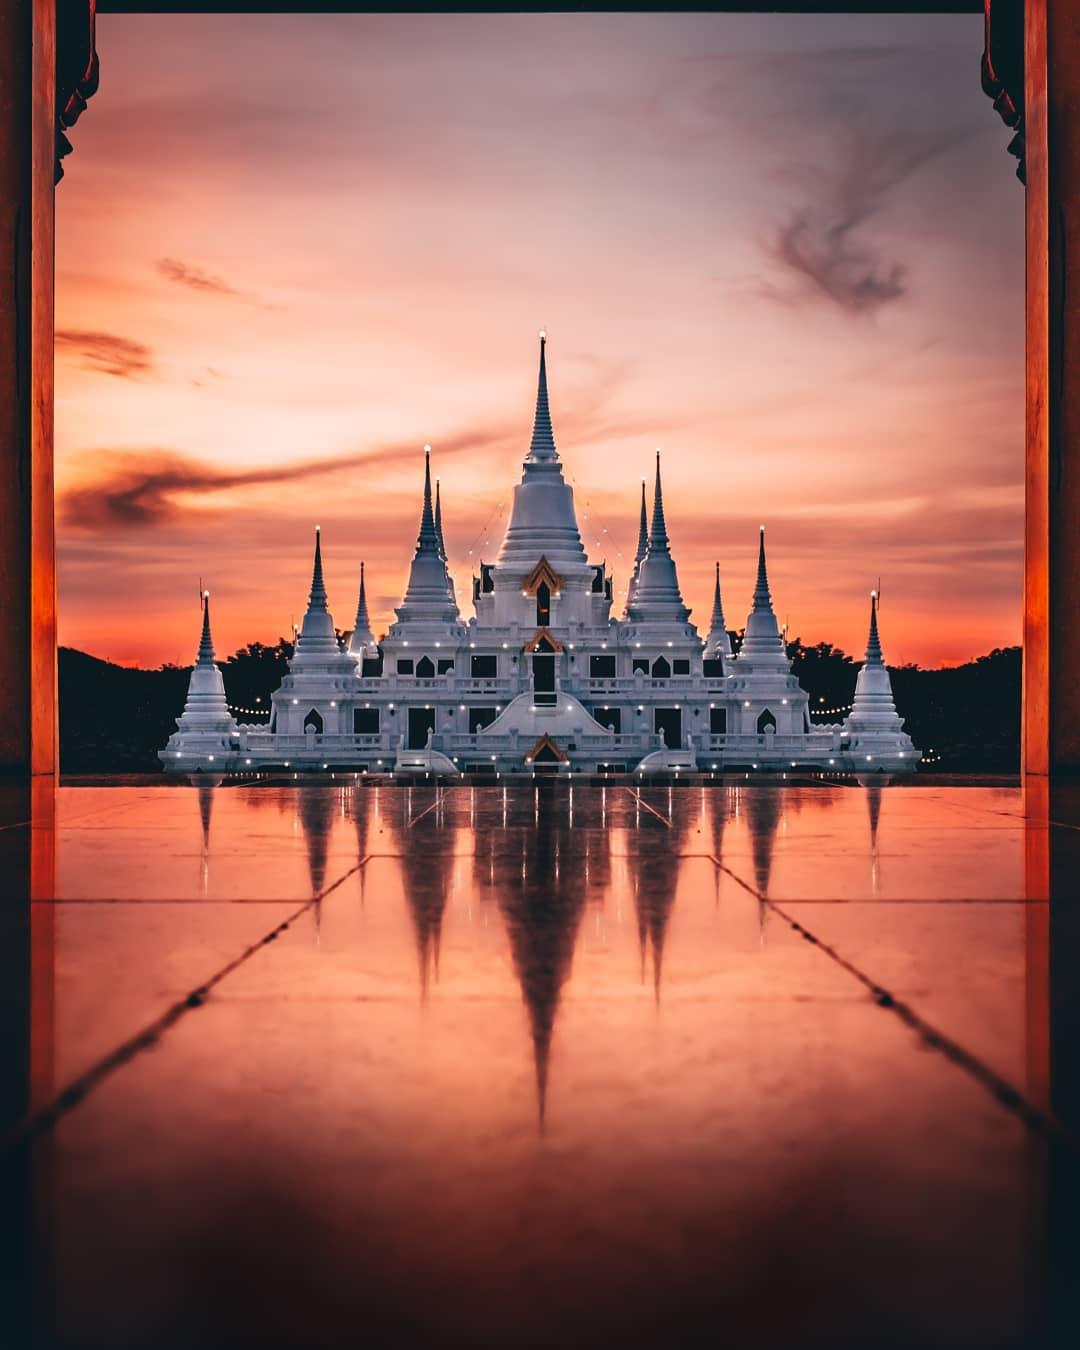 Wat Asokaram, White Temple, Samut Prakan, Bangkok, Thailand by Kan Kankavee